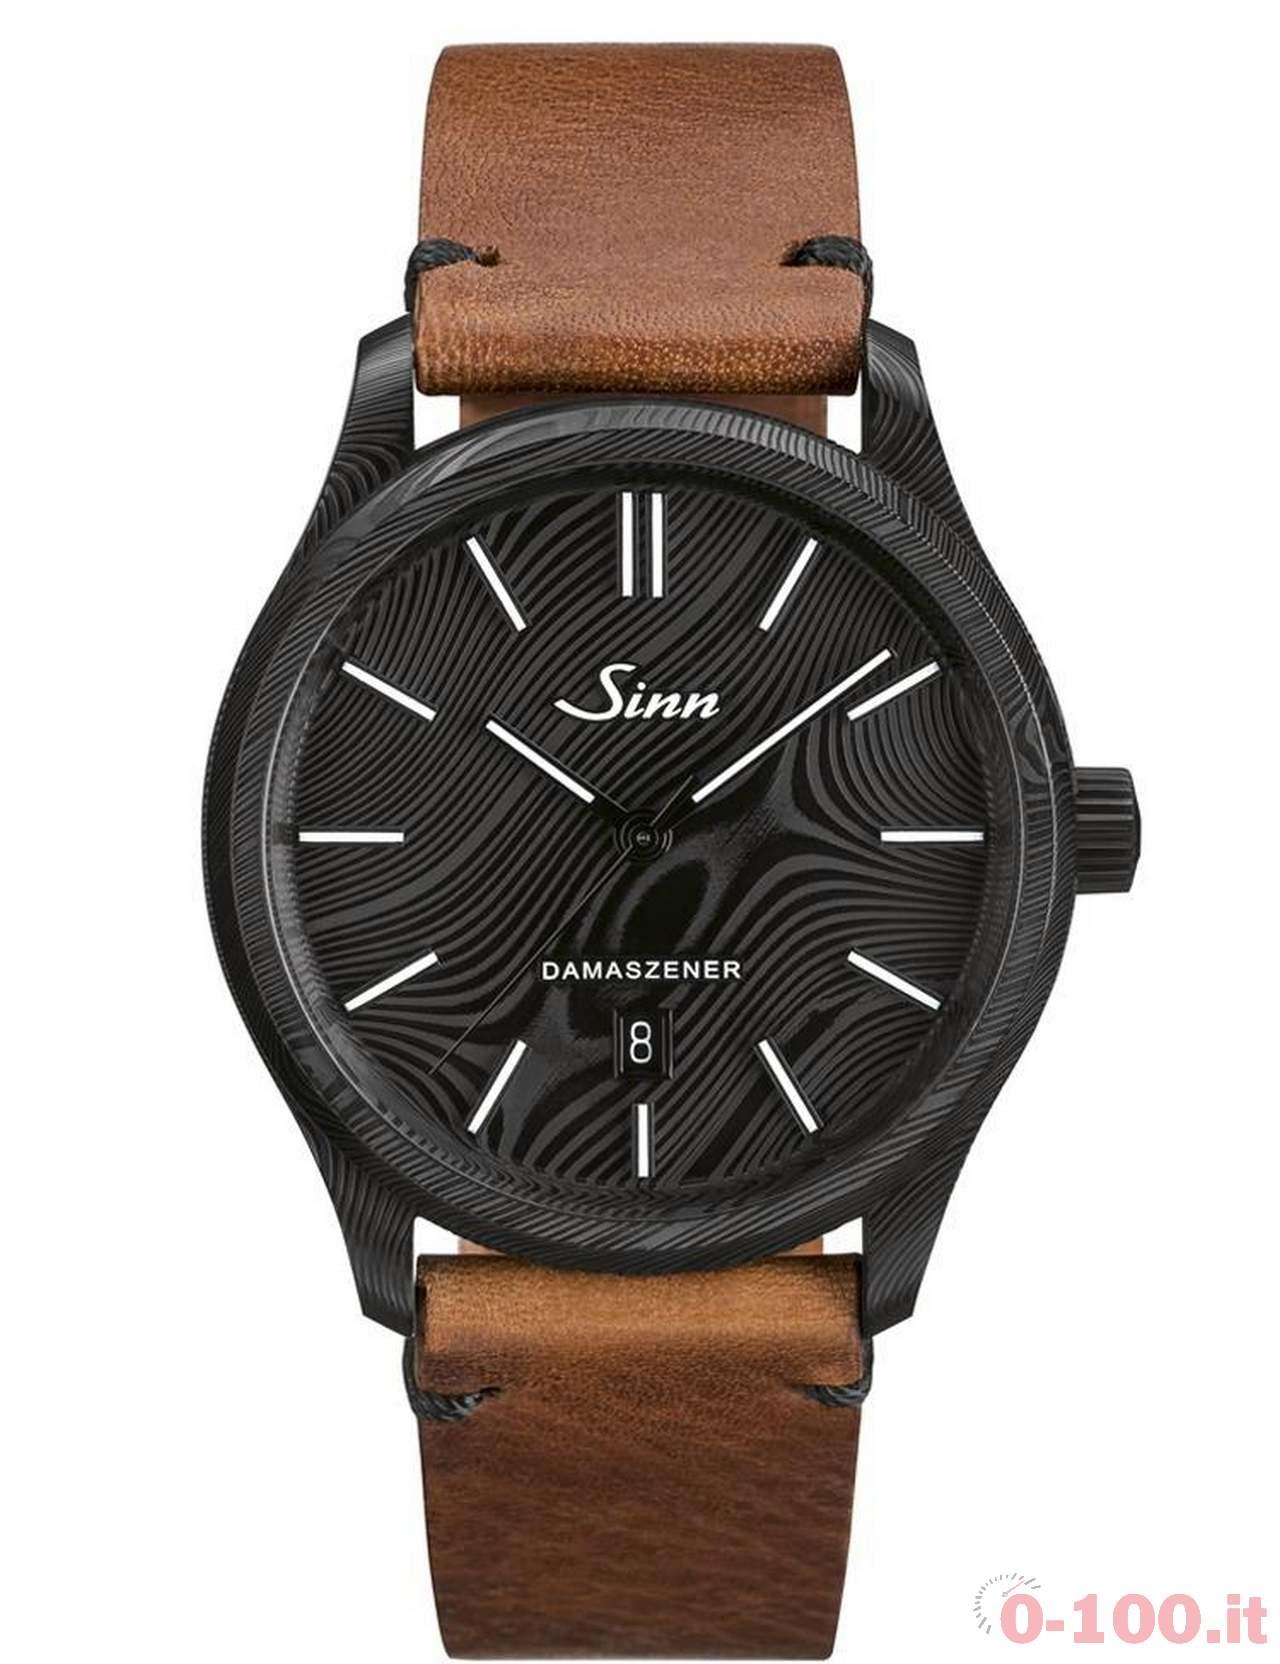 sinn-1800-s-damaszener-limited-edition-prezzo-price_0-1004